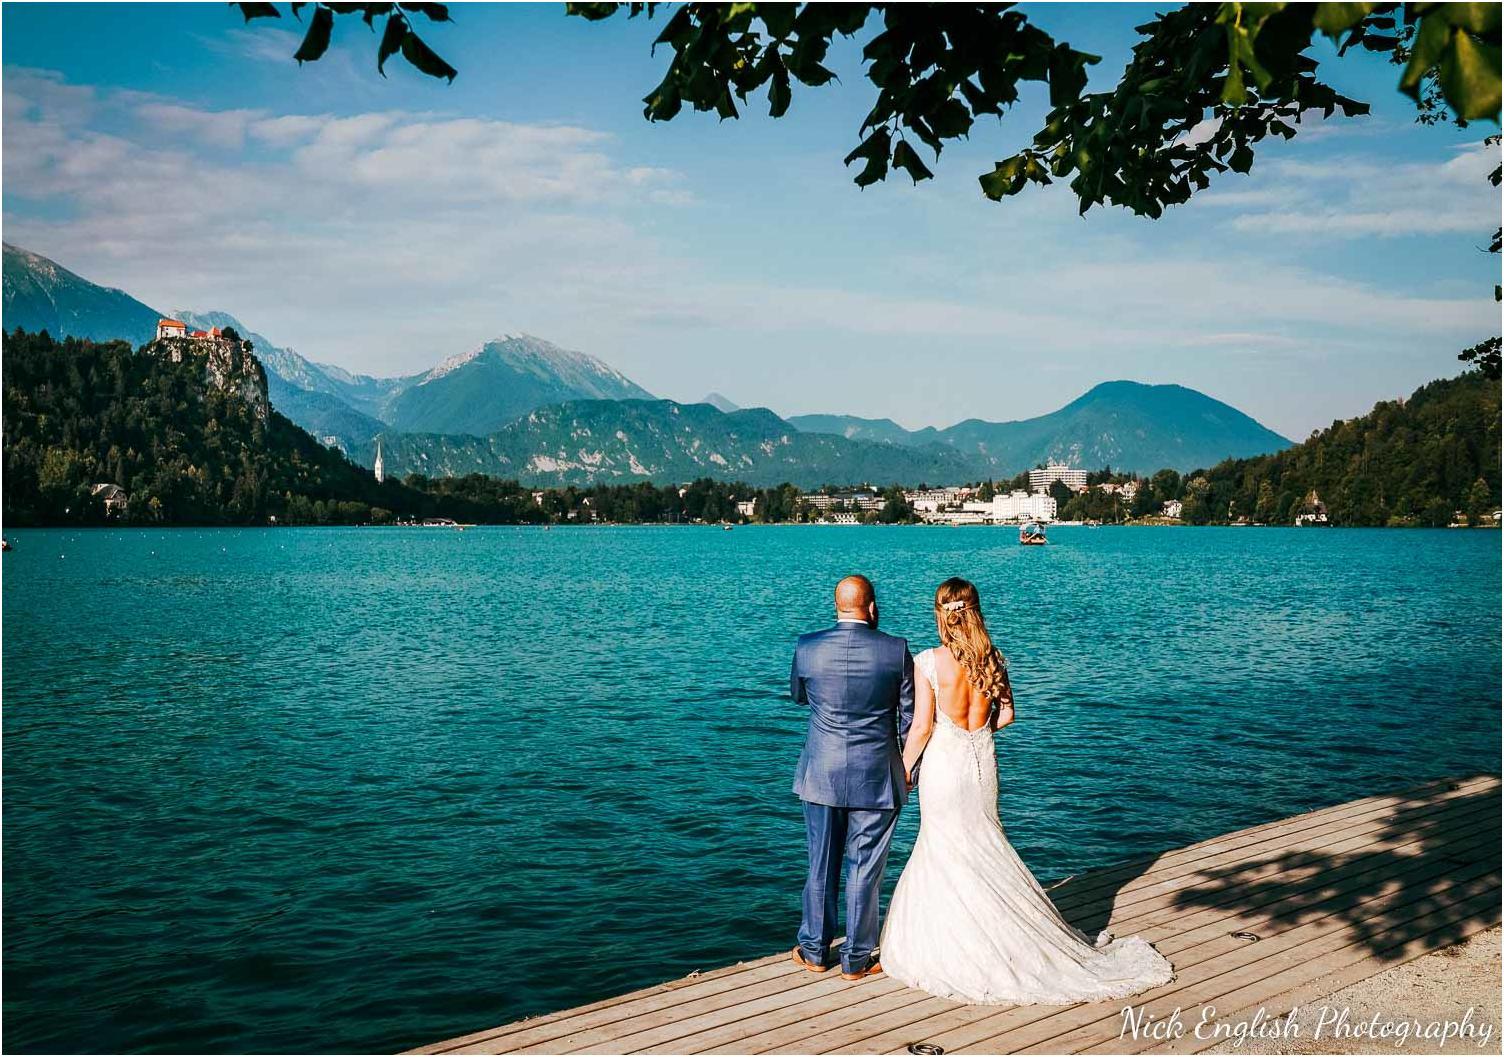 Destination_Wedding_Photographer_Slovenia_Nick_English_Photography-70-23.jpg